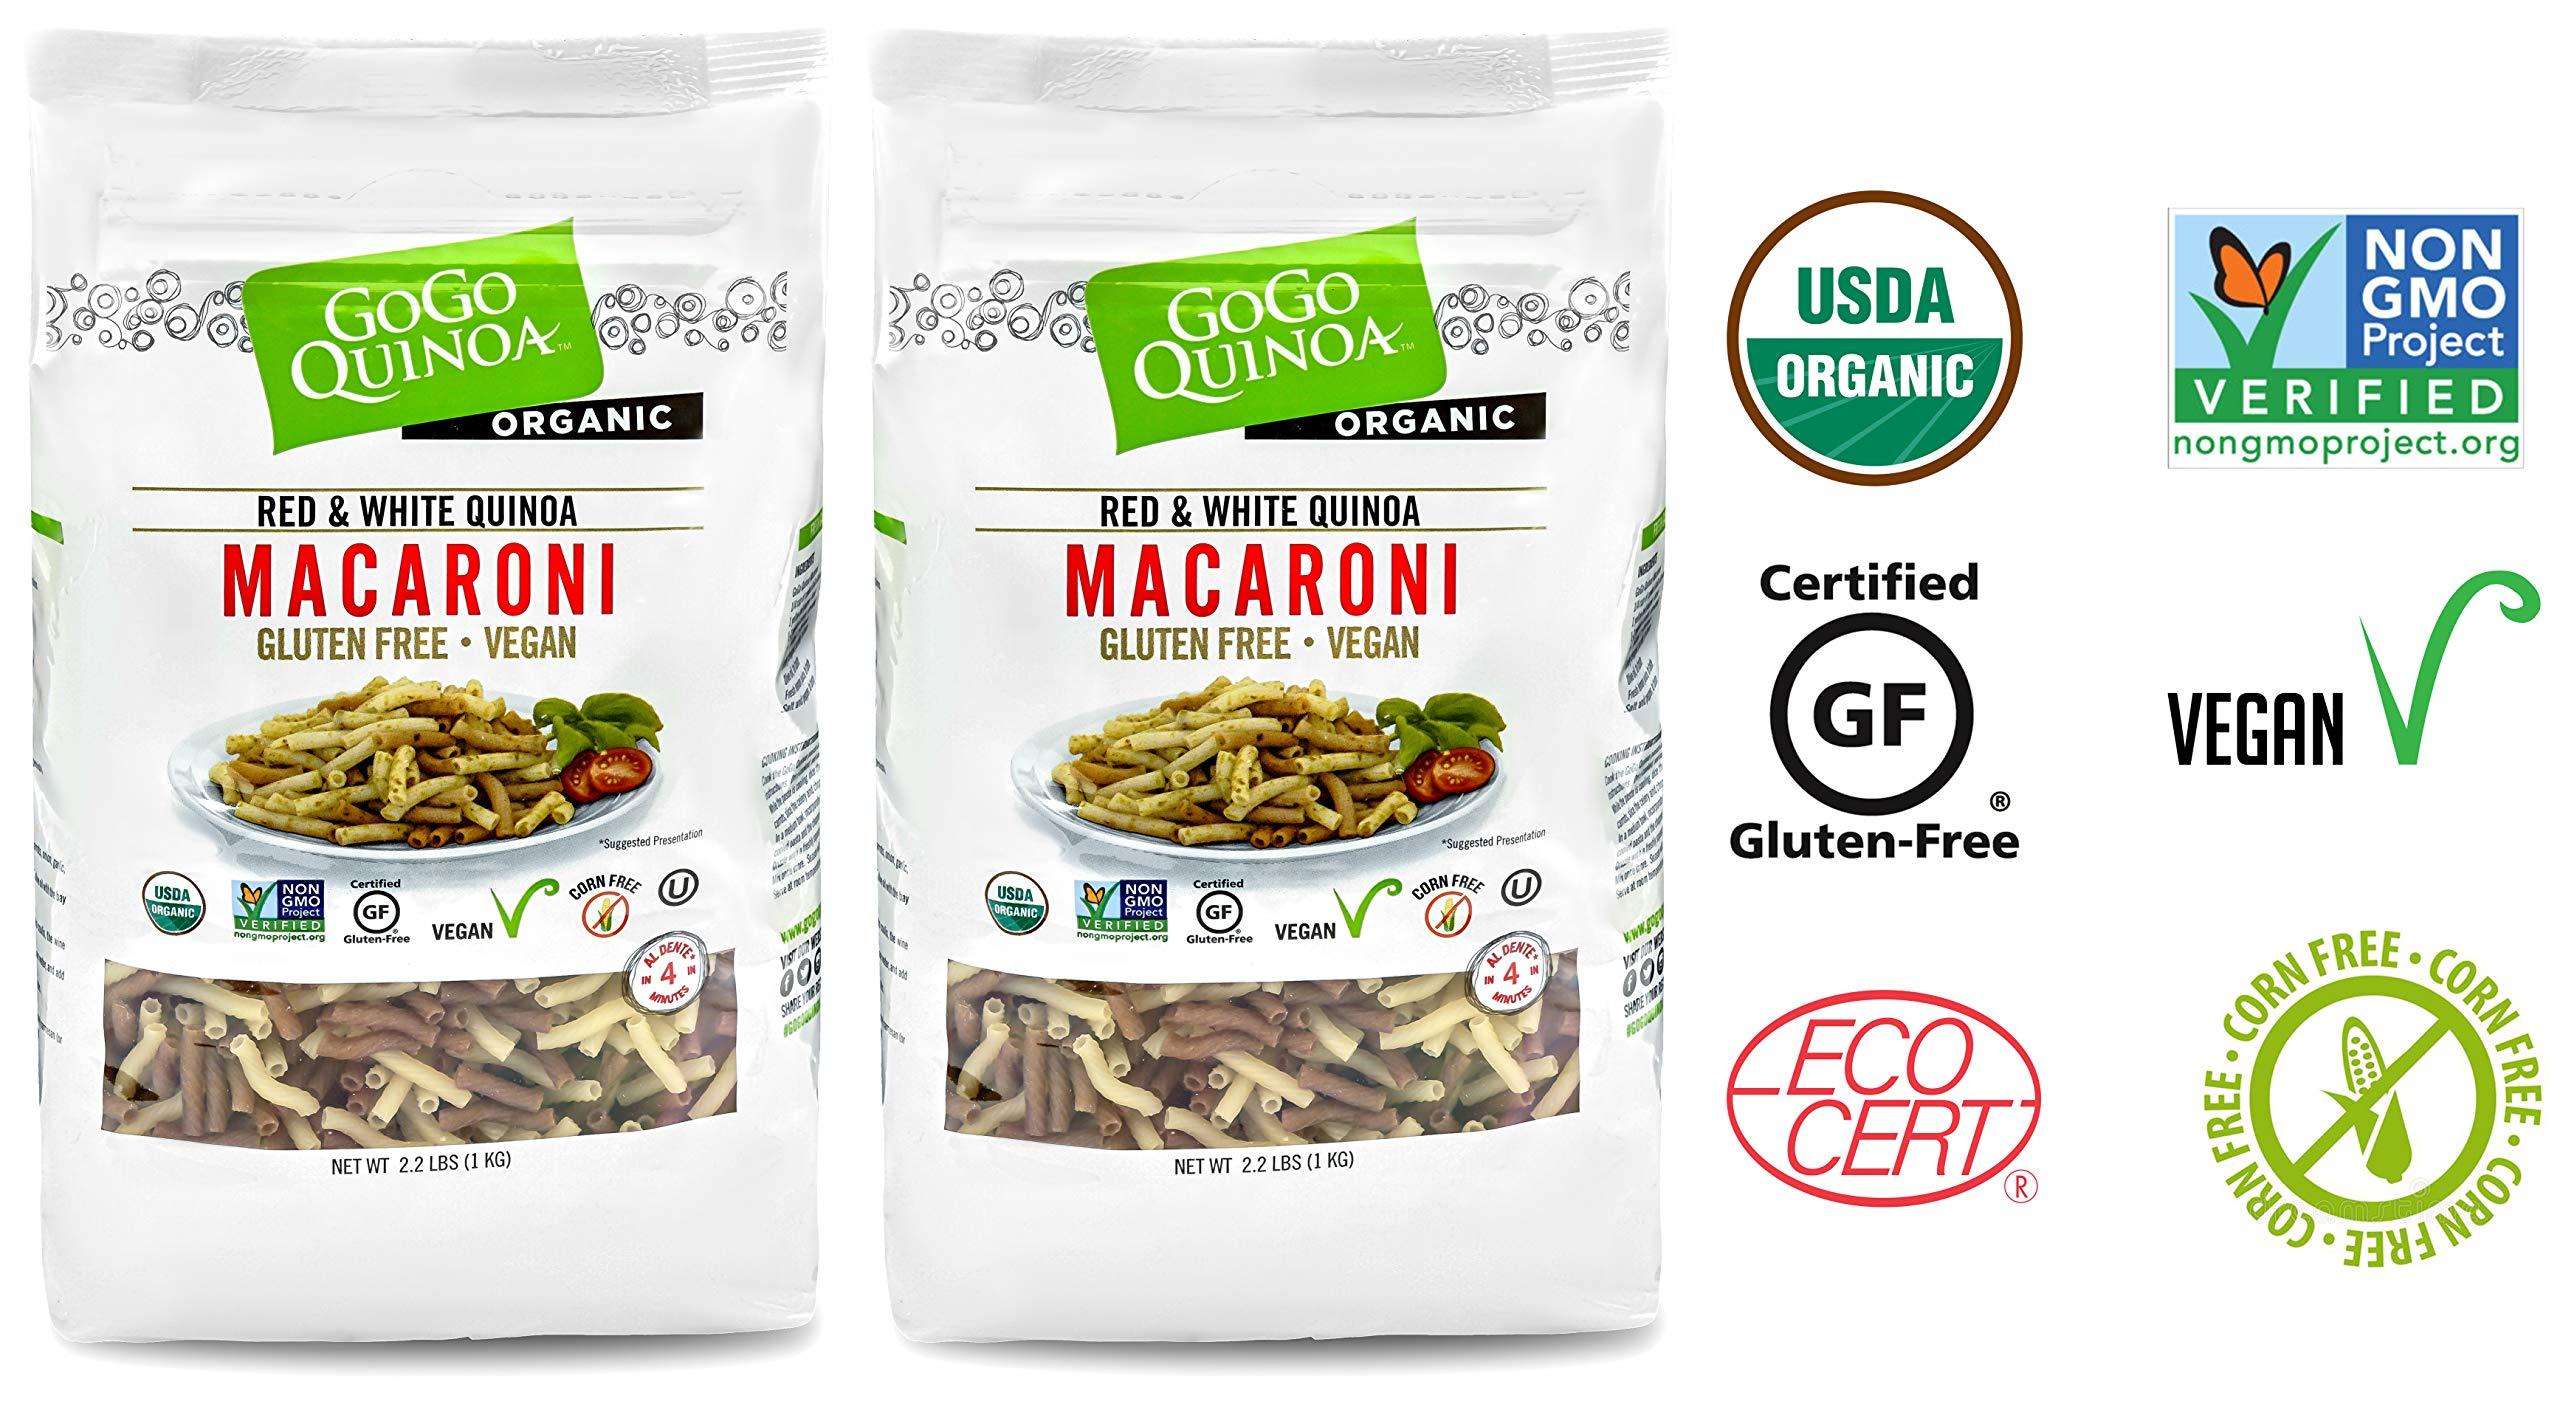 Gogo Quinoa Gluten Free Organic Red and White macaroni Organic, Gluten Free and Non-GMO Certified, Corn free and Vegan 4.4 Lbs by GoGo Quinoa